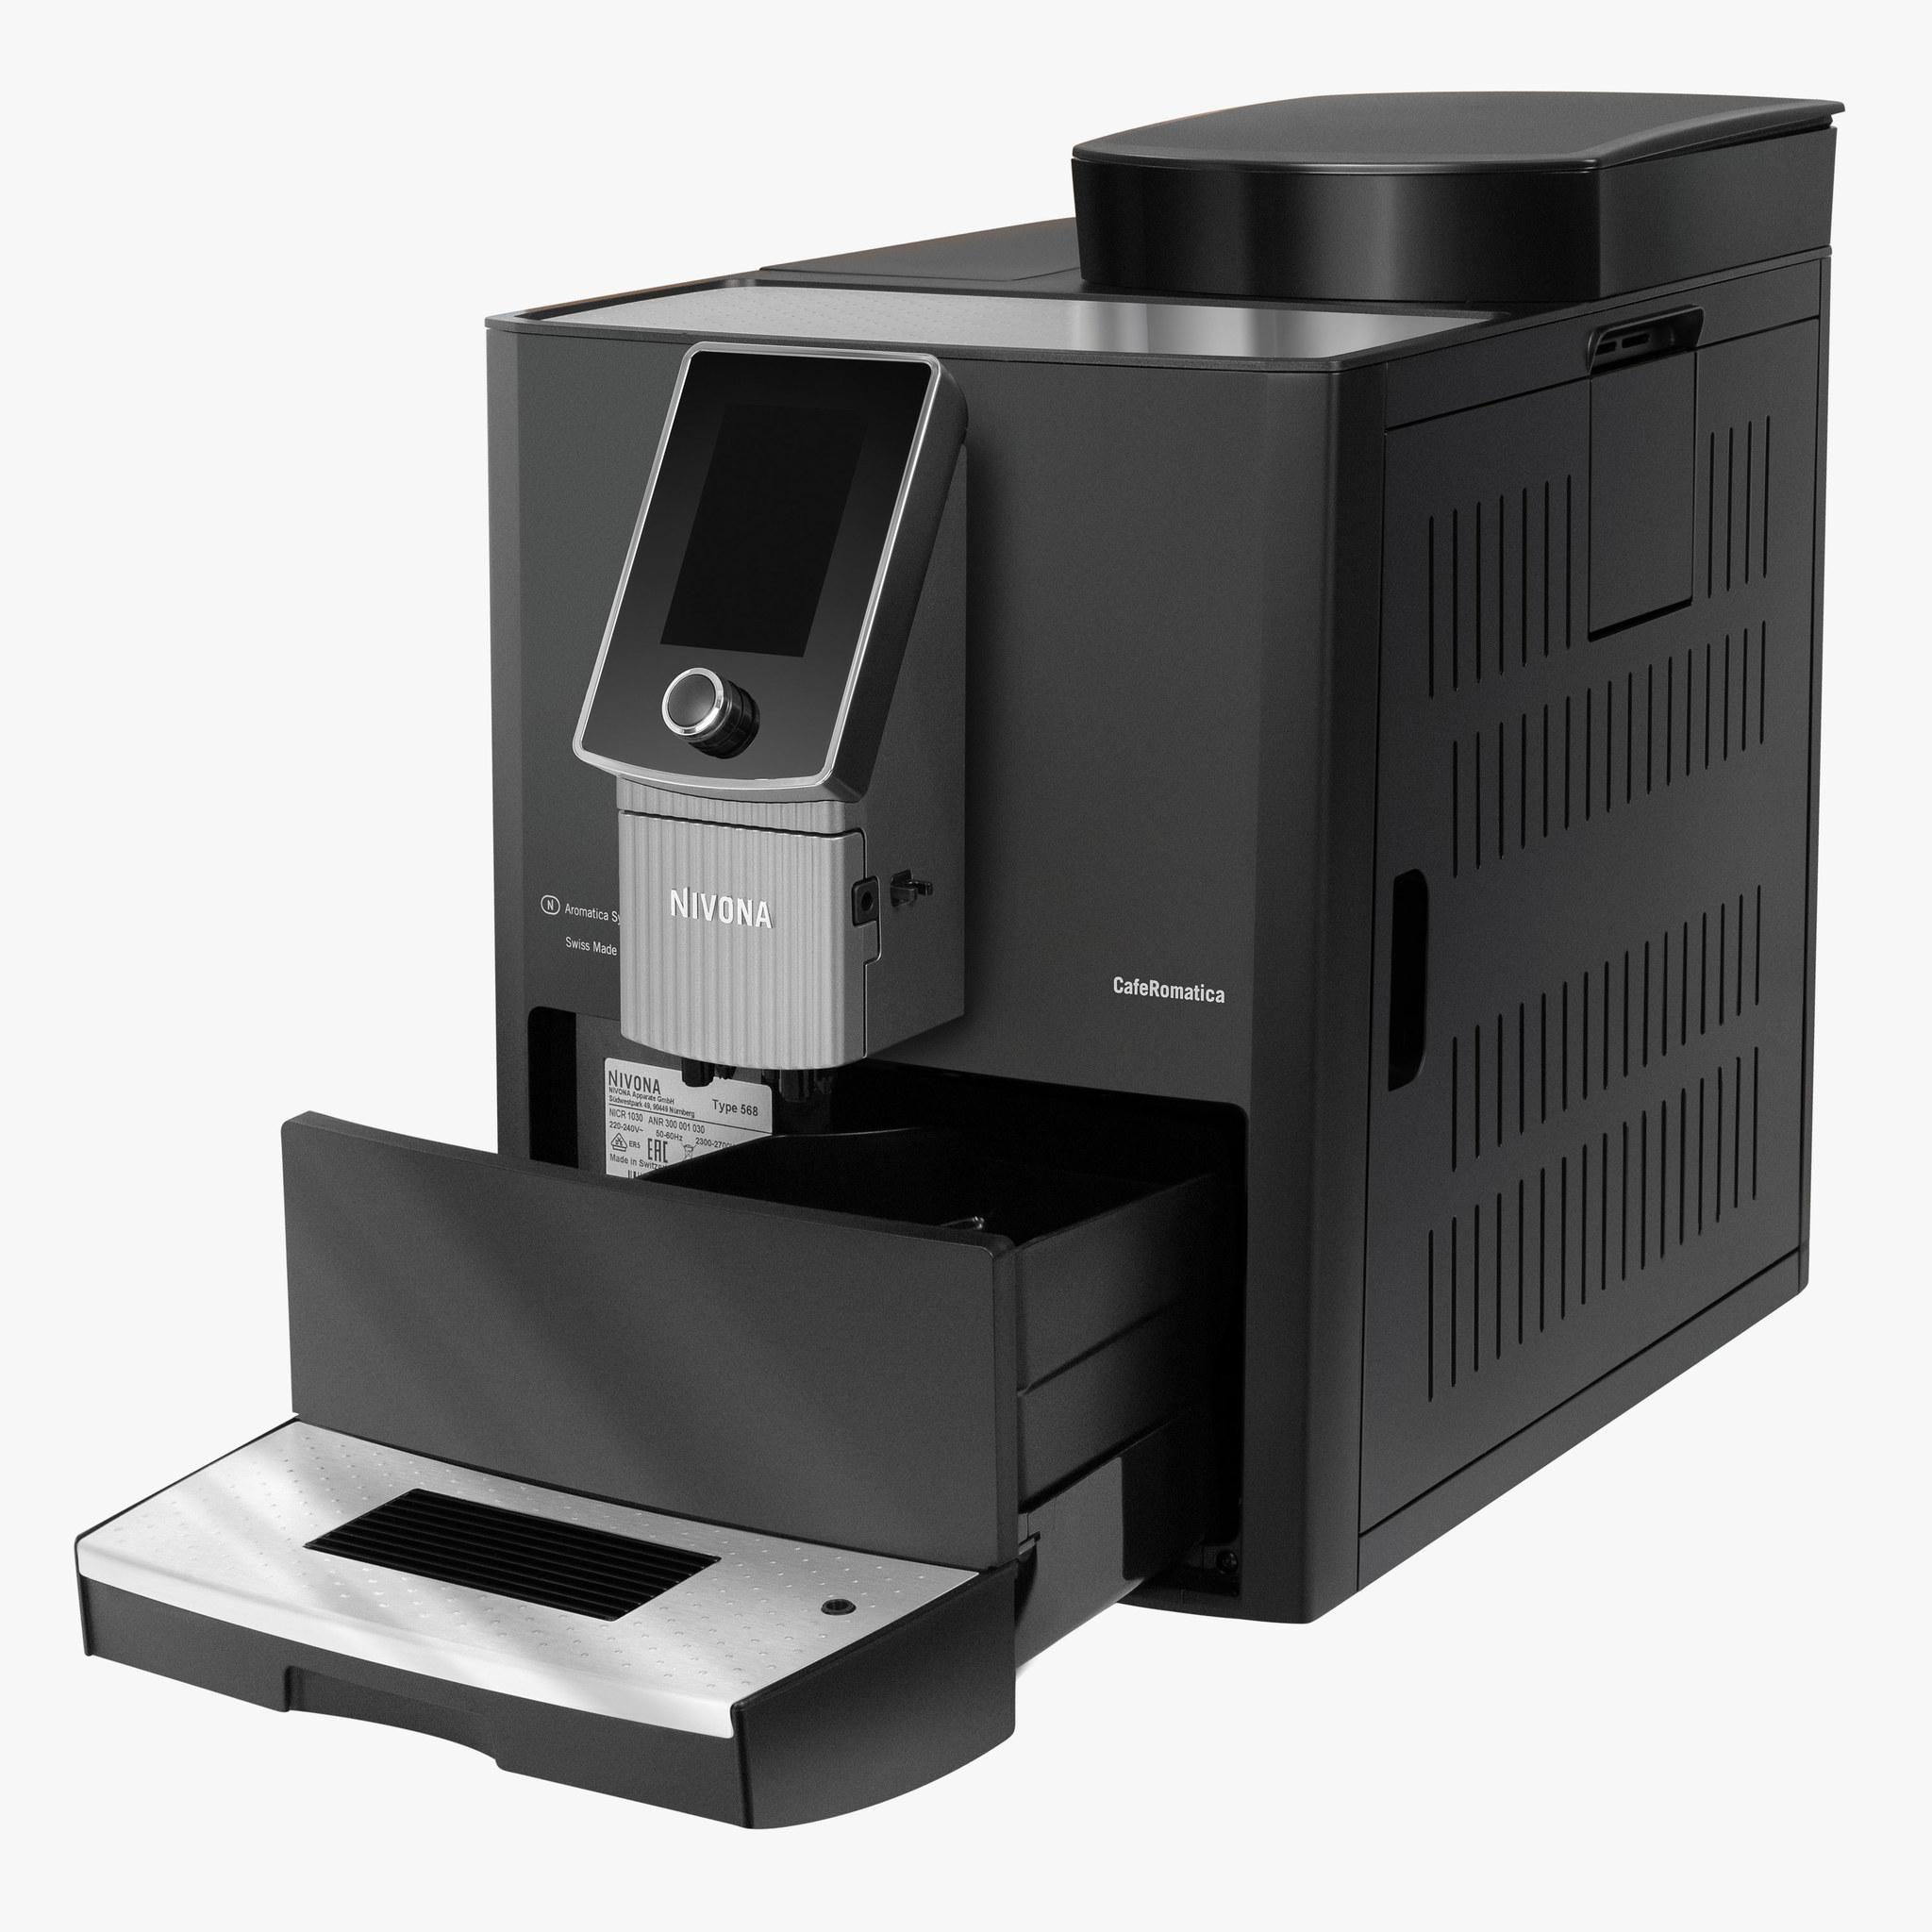 Кофемашина Nivona NICR 1030 + кофе в зернах Craft, Platinum, Oro, Delikato, Latina Fuerte